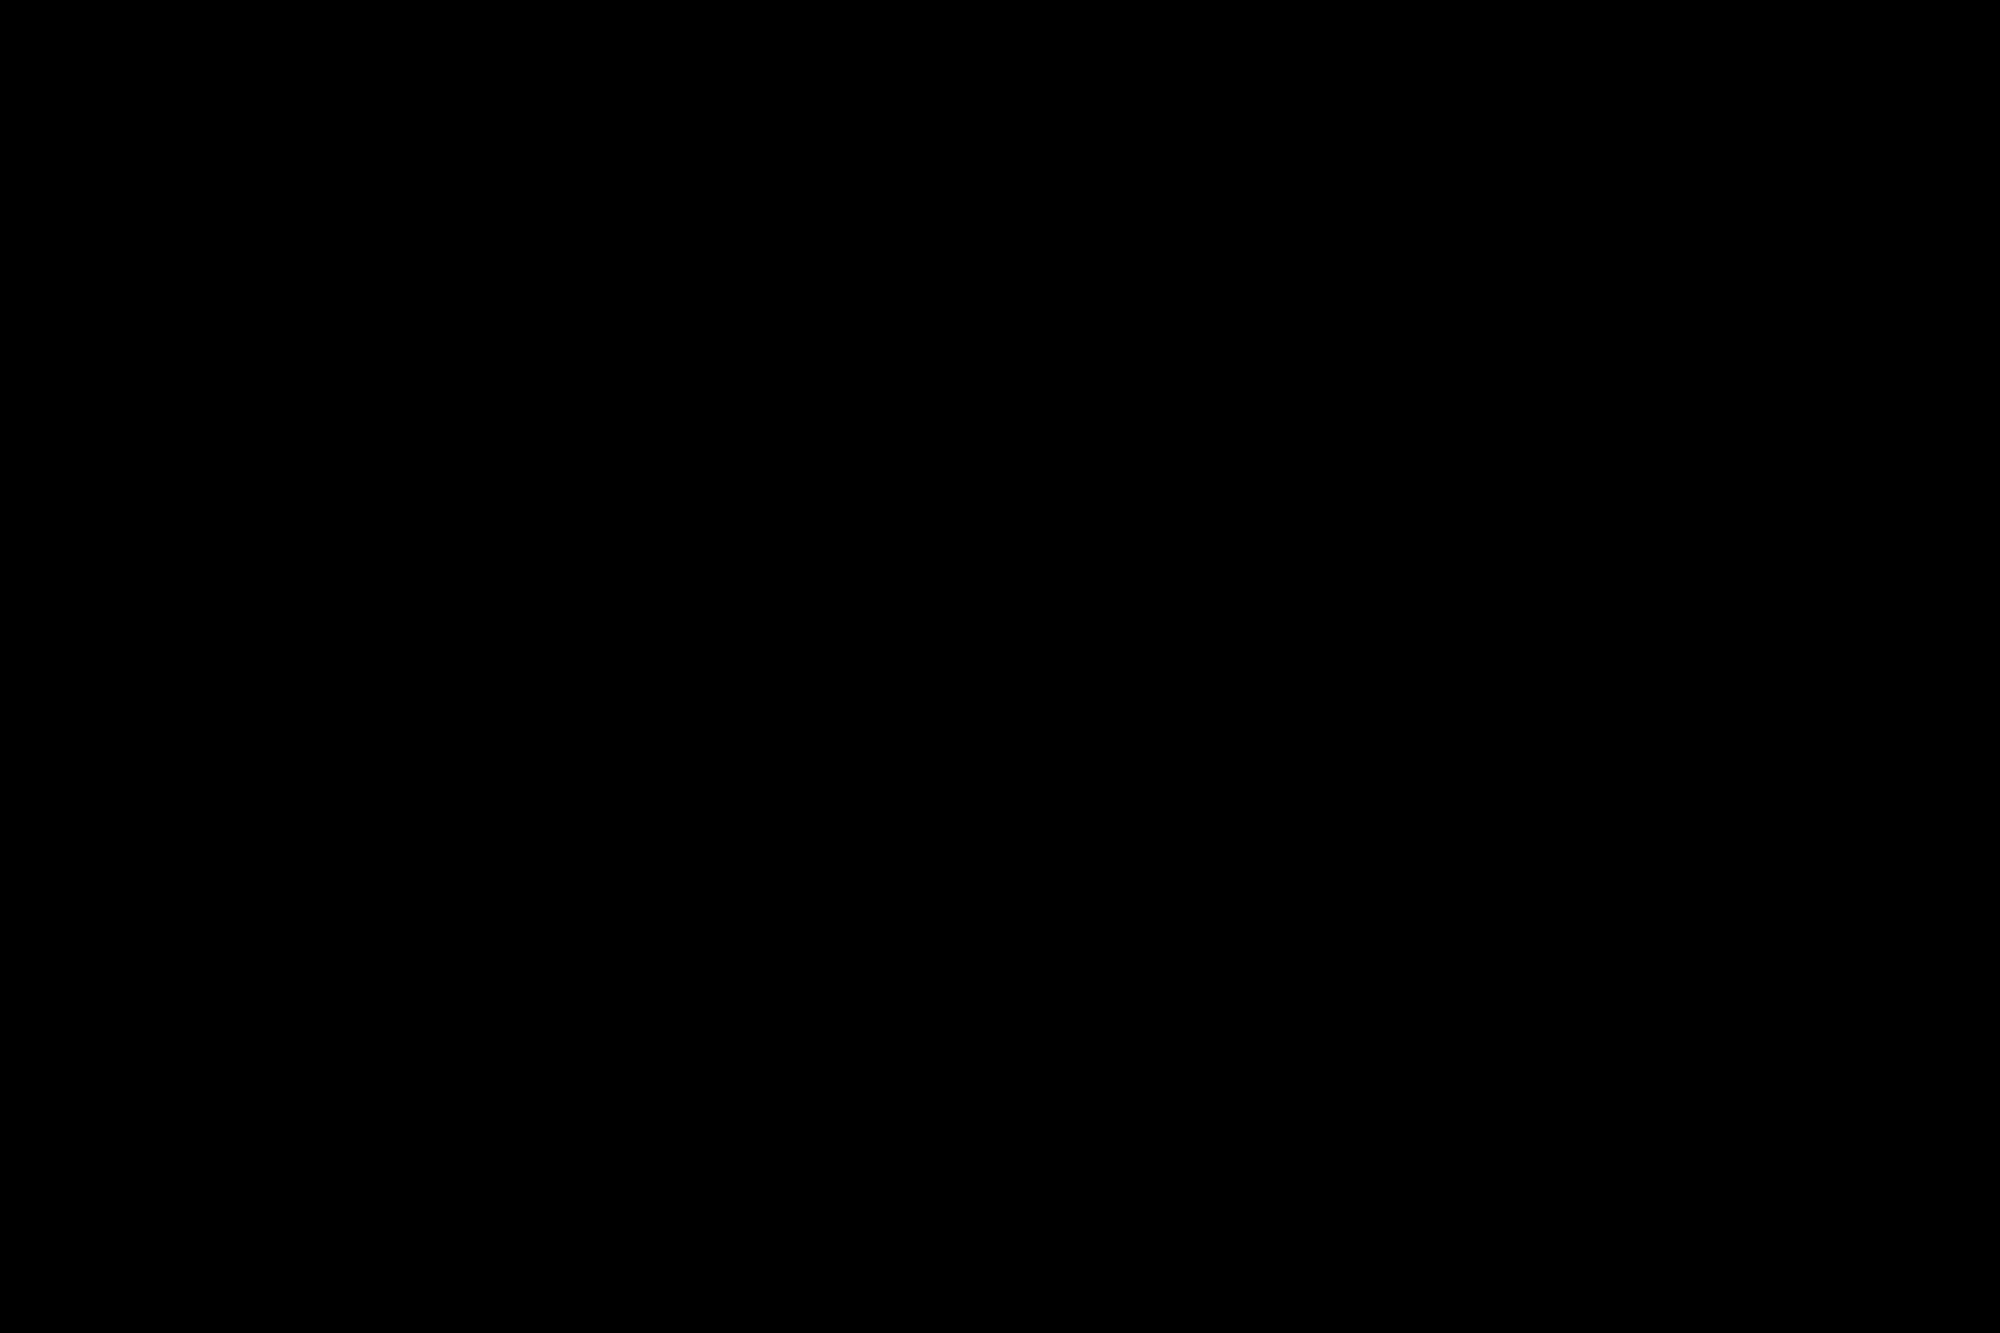 ONSHORE COLLABORATION CENTRE FOR AKER BP – Jåttåvågveien 10